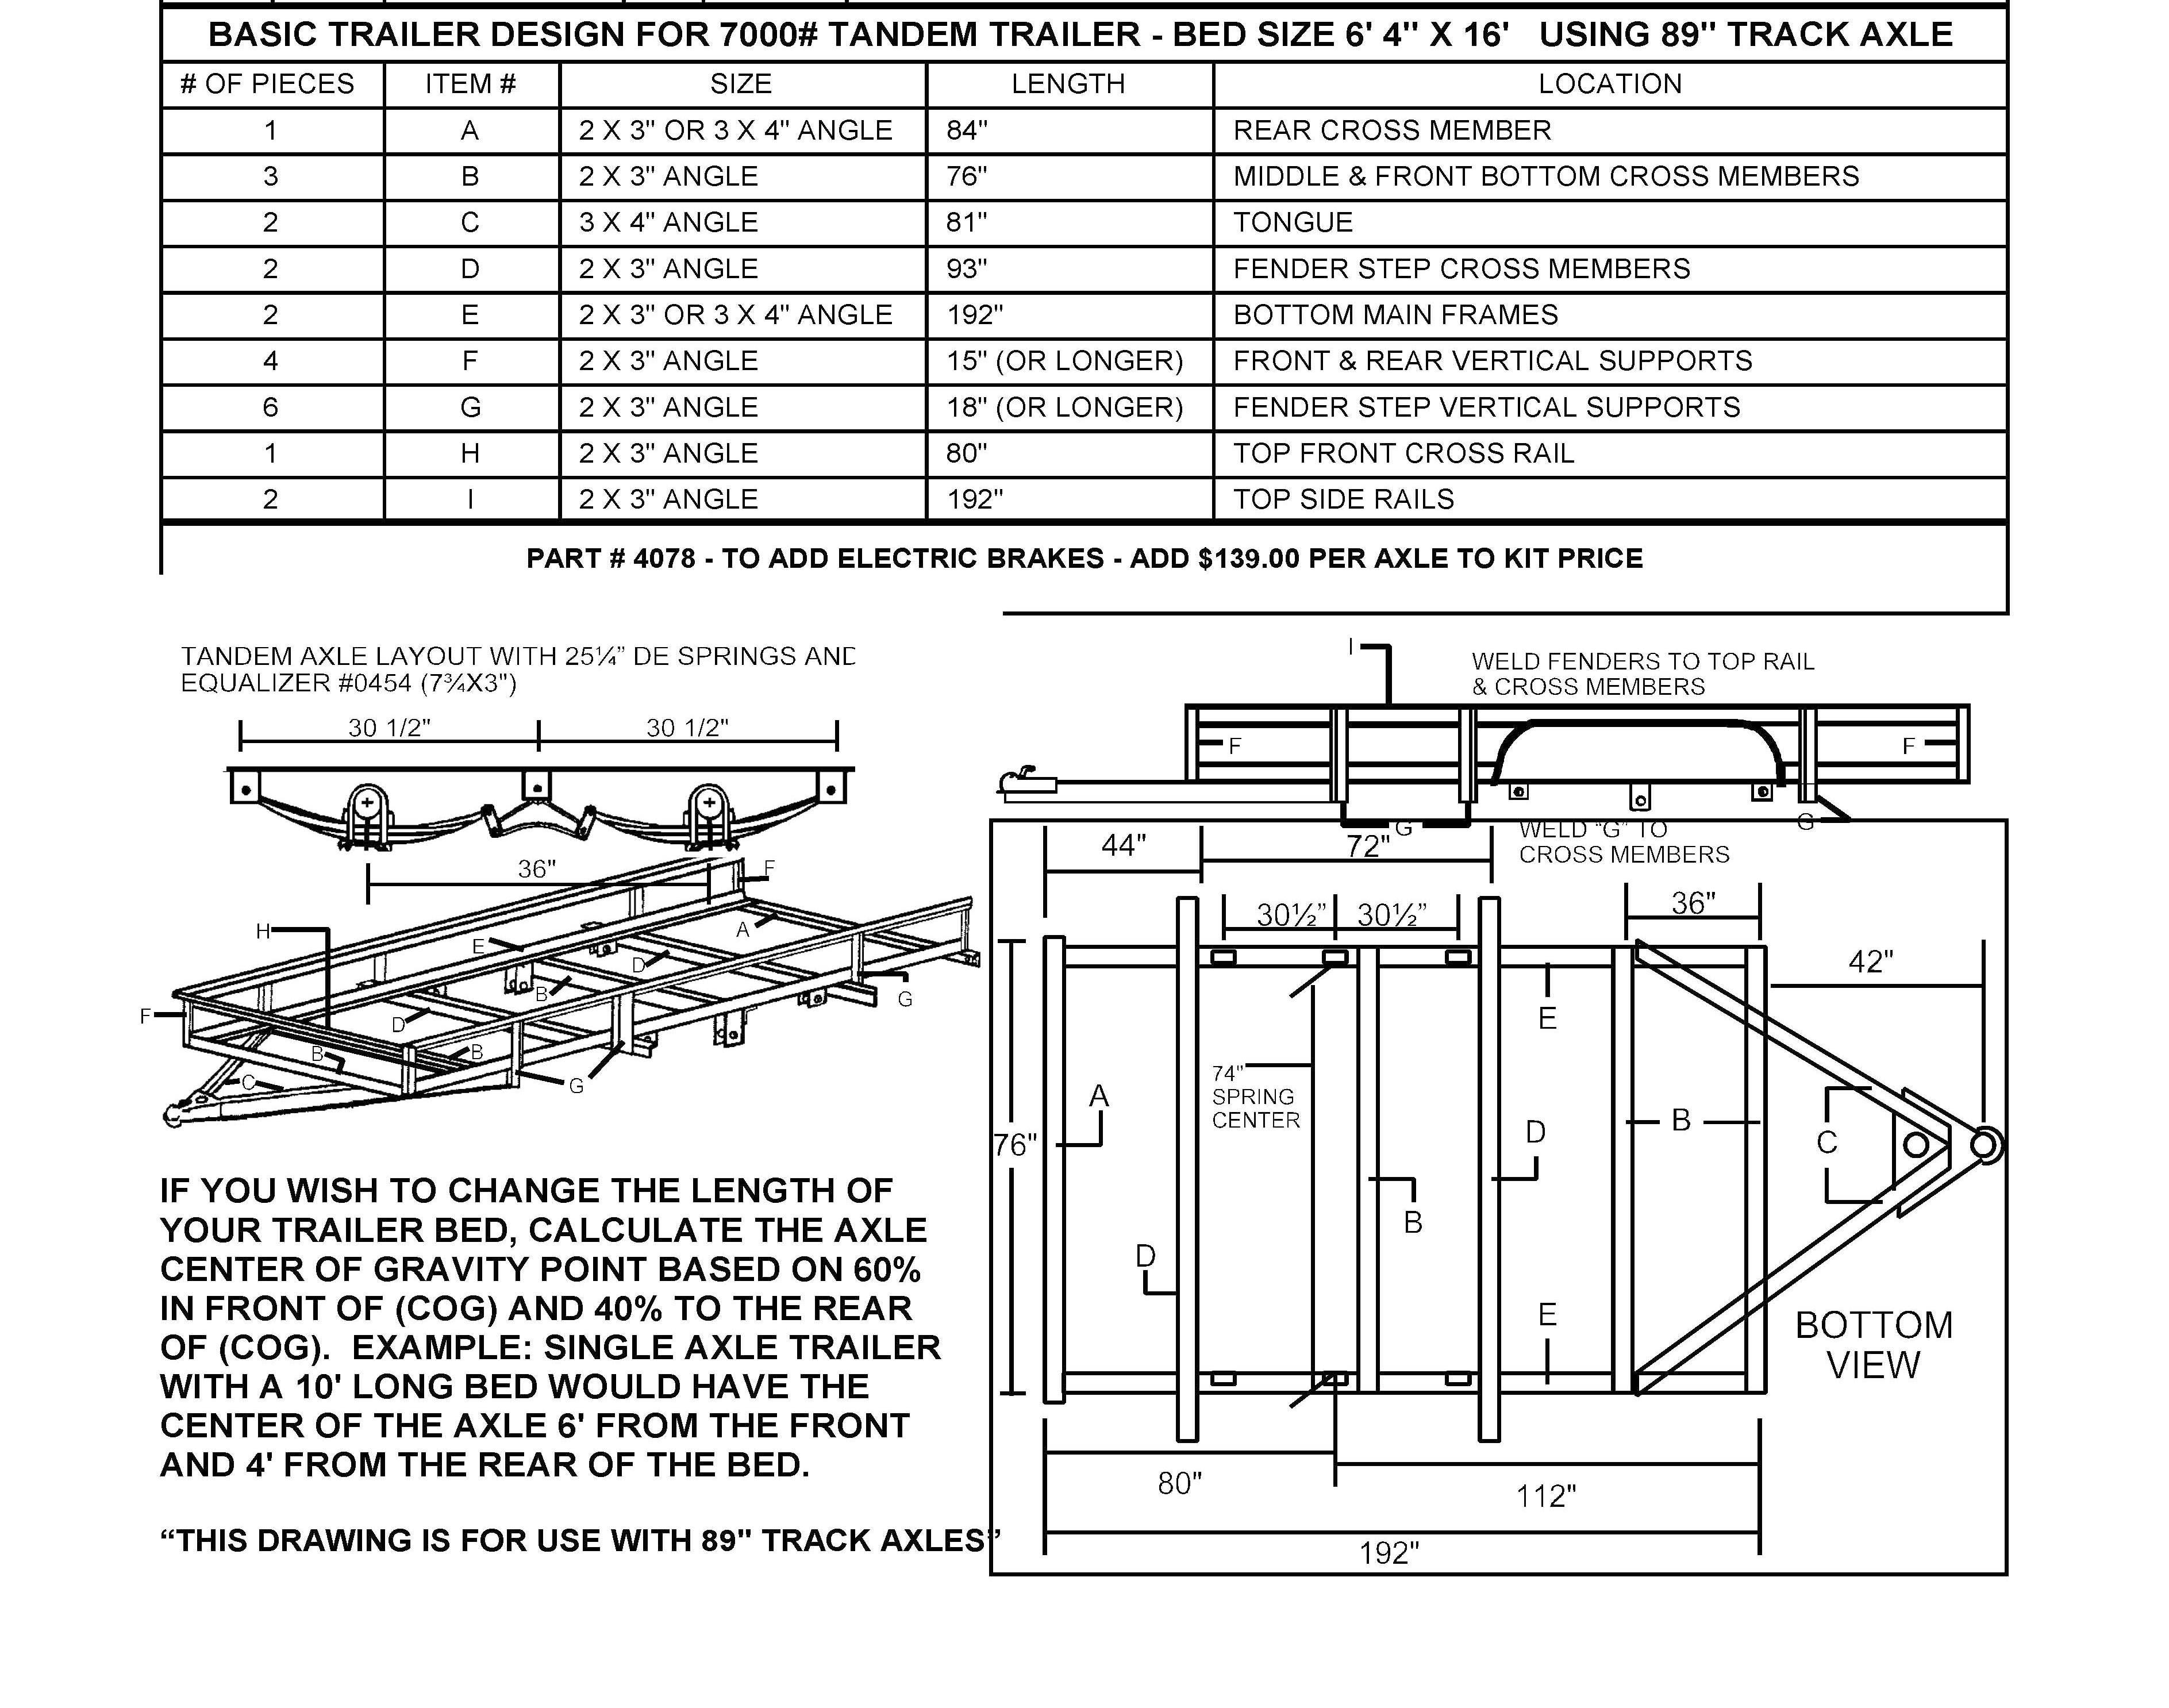 tandem trailer parts diagram?t=1398725710 89\